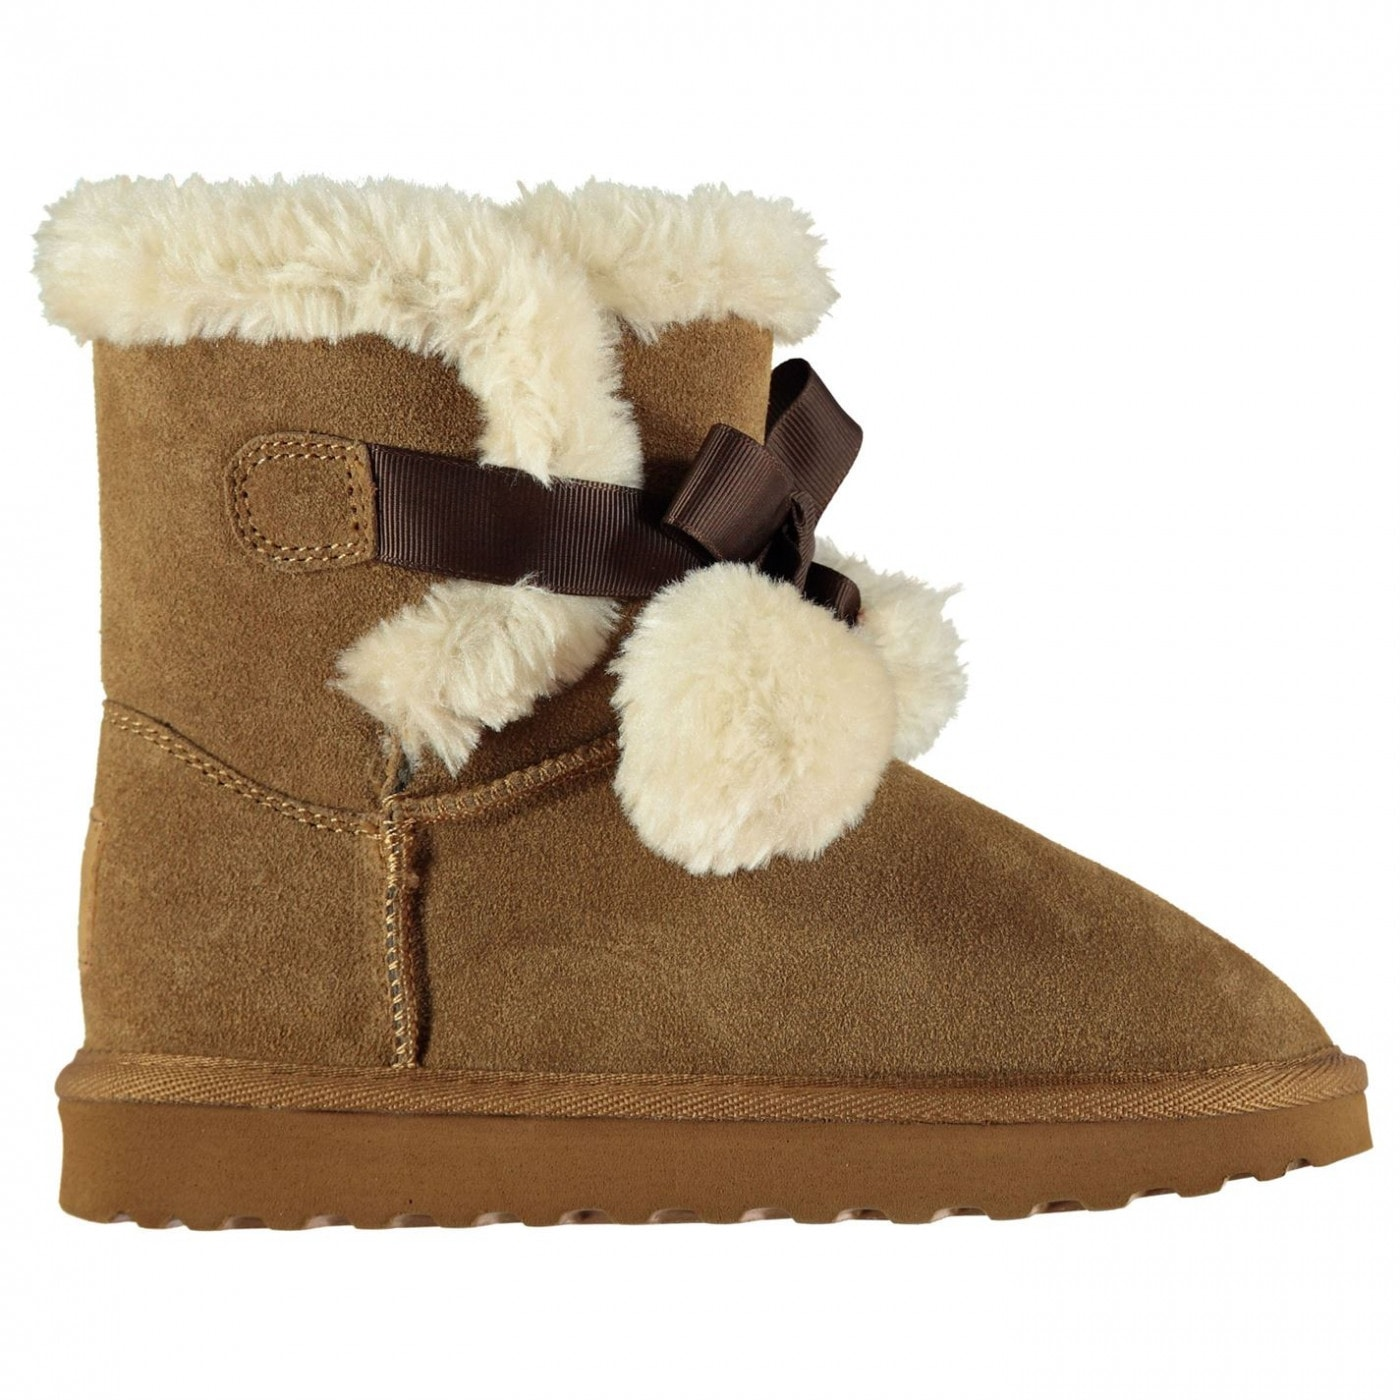 SoulCal Carmel Snug Boots Infant Girls